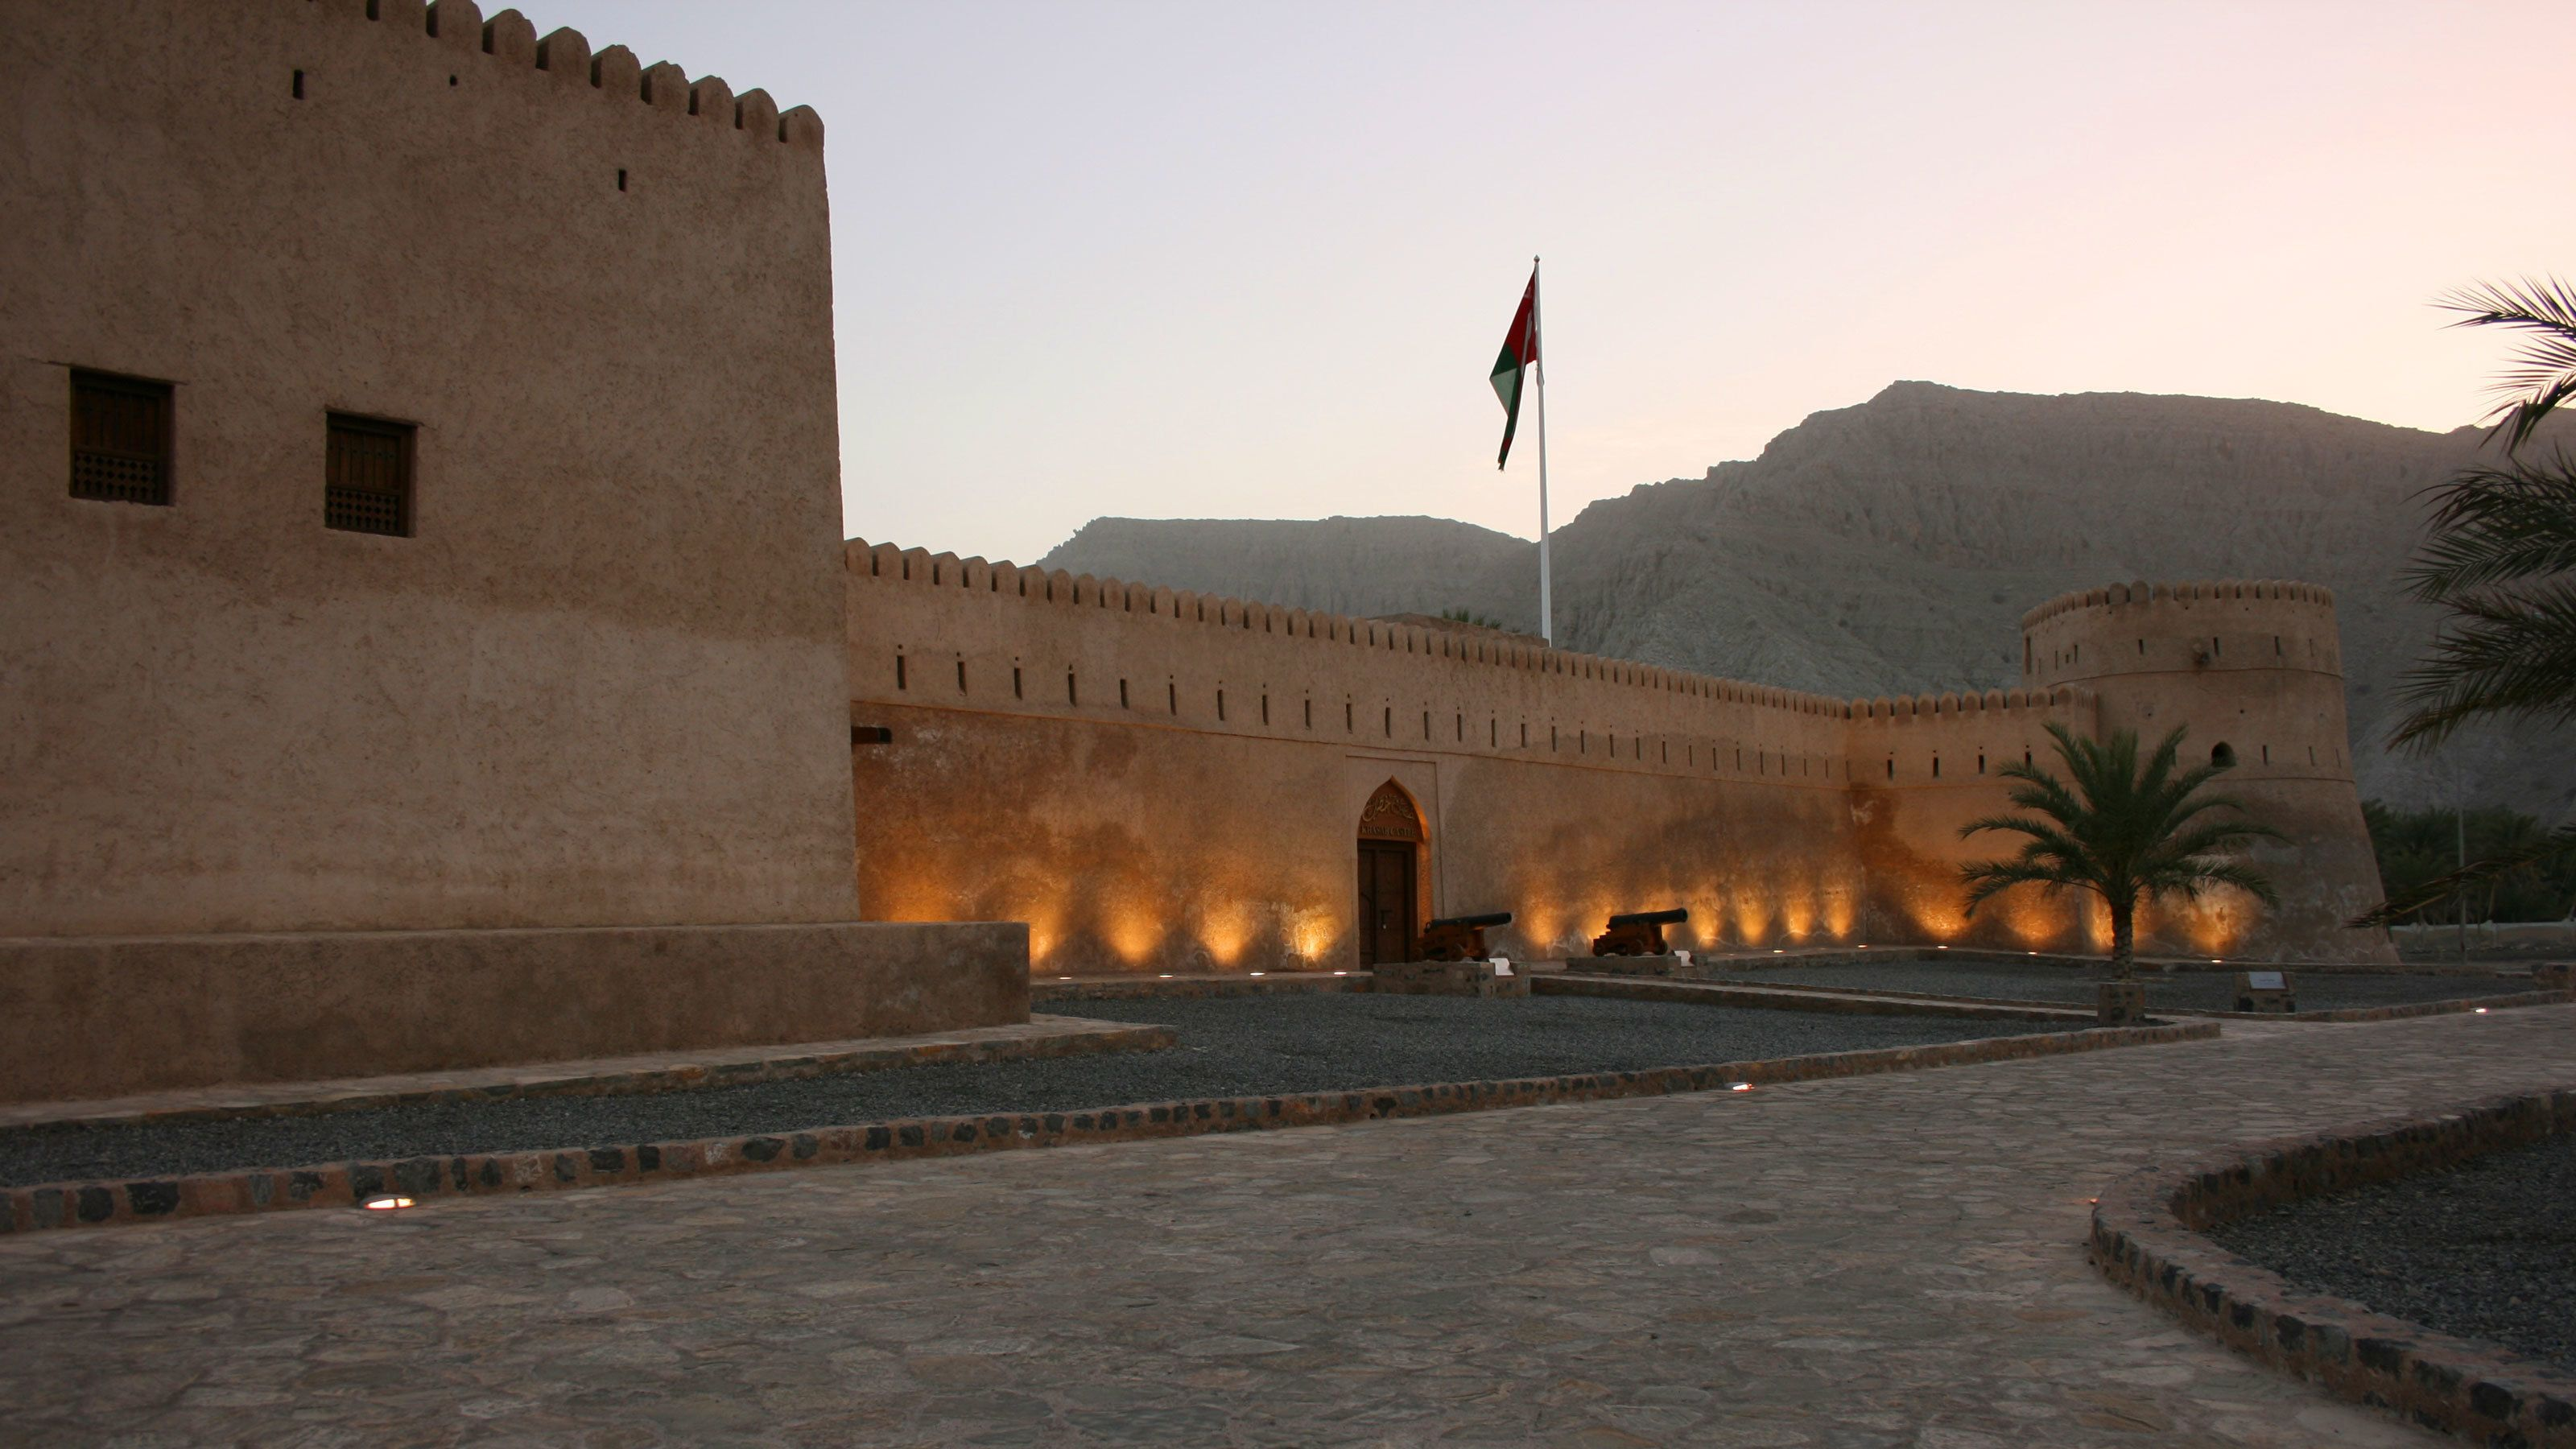 Arabian style building in Musandam